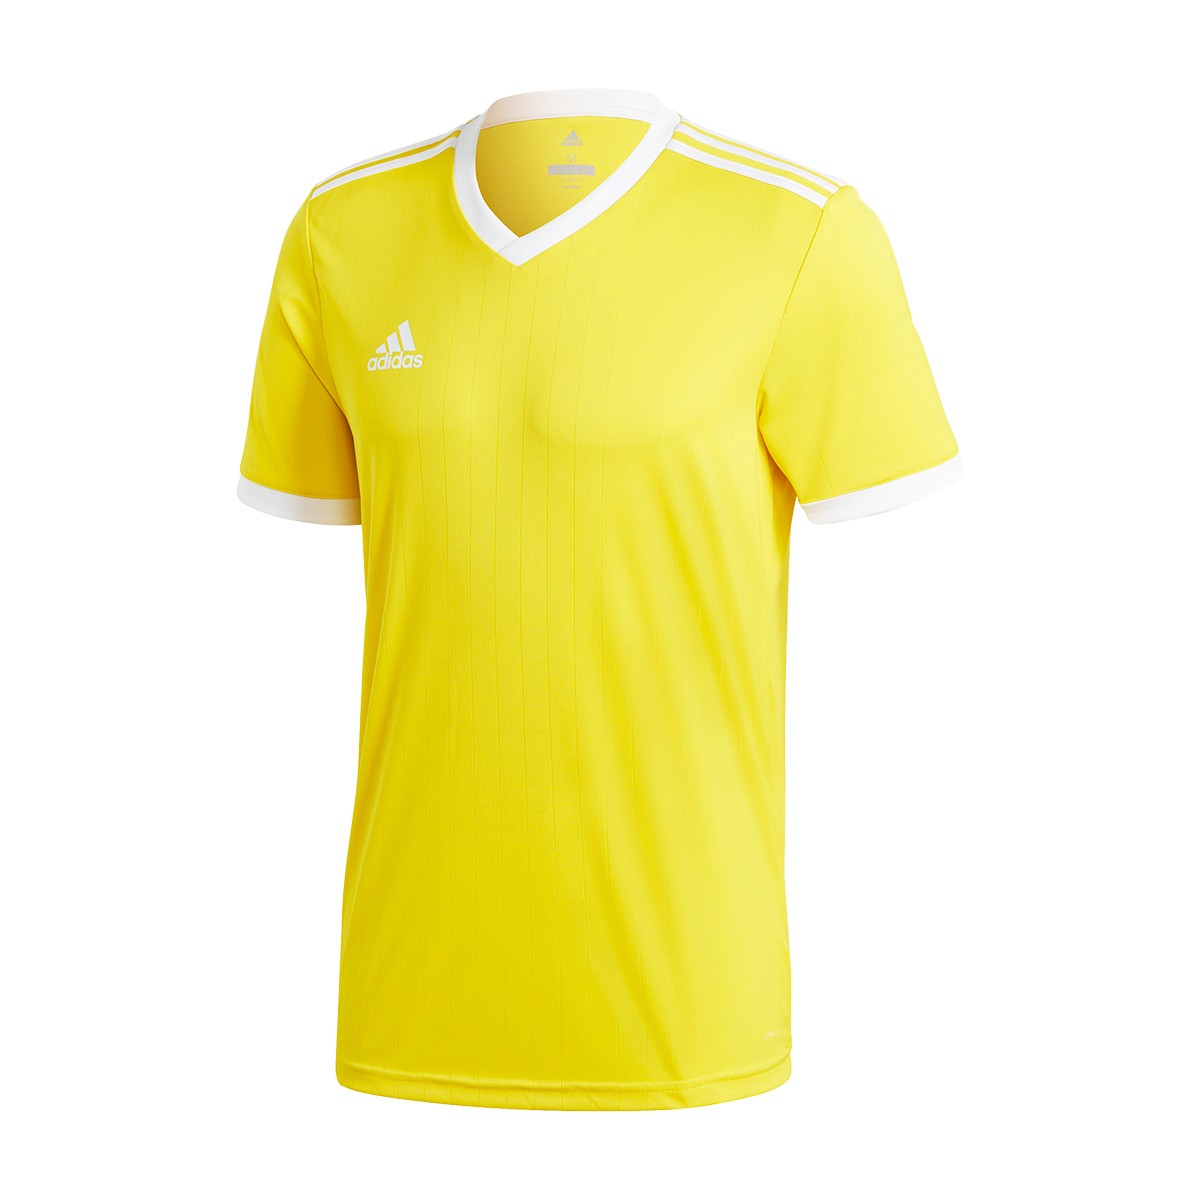 f3d280cc3 Jersey adidas Tabela 18 m/c Yellow-White - Tienda de fútbol Fútbol Emotion